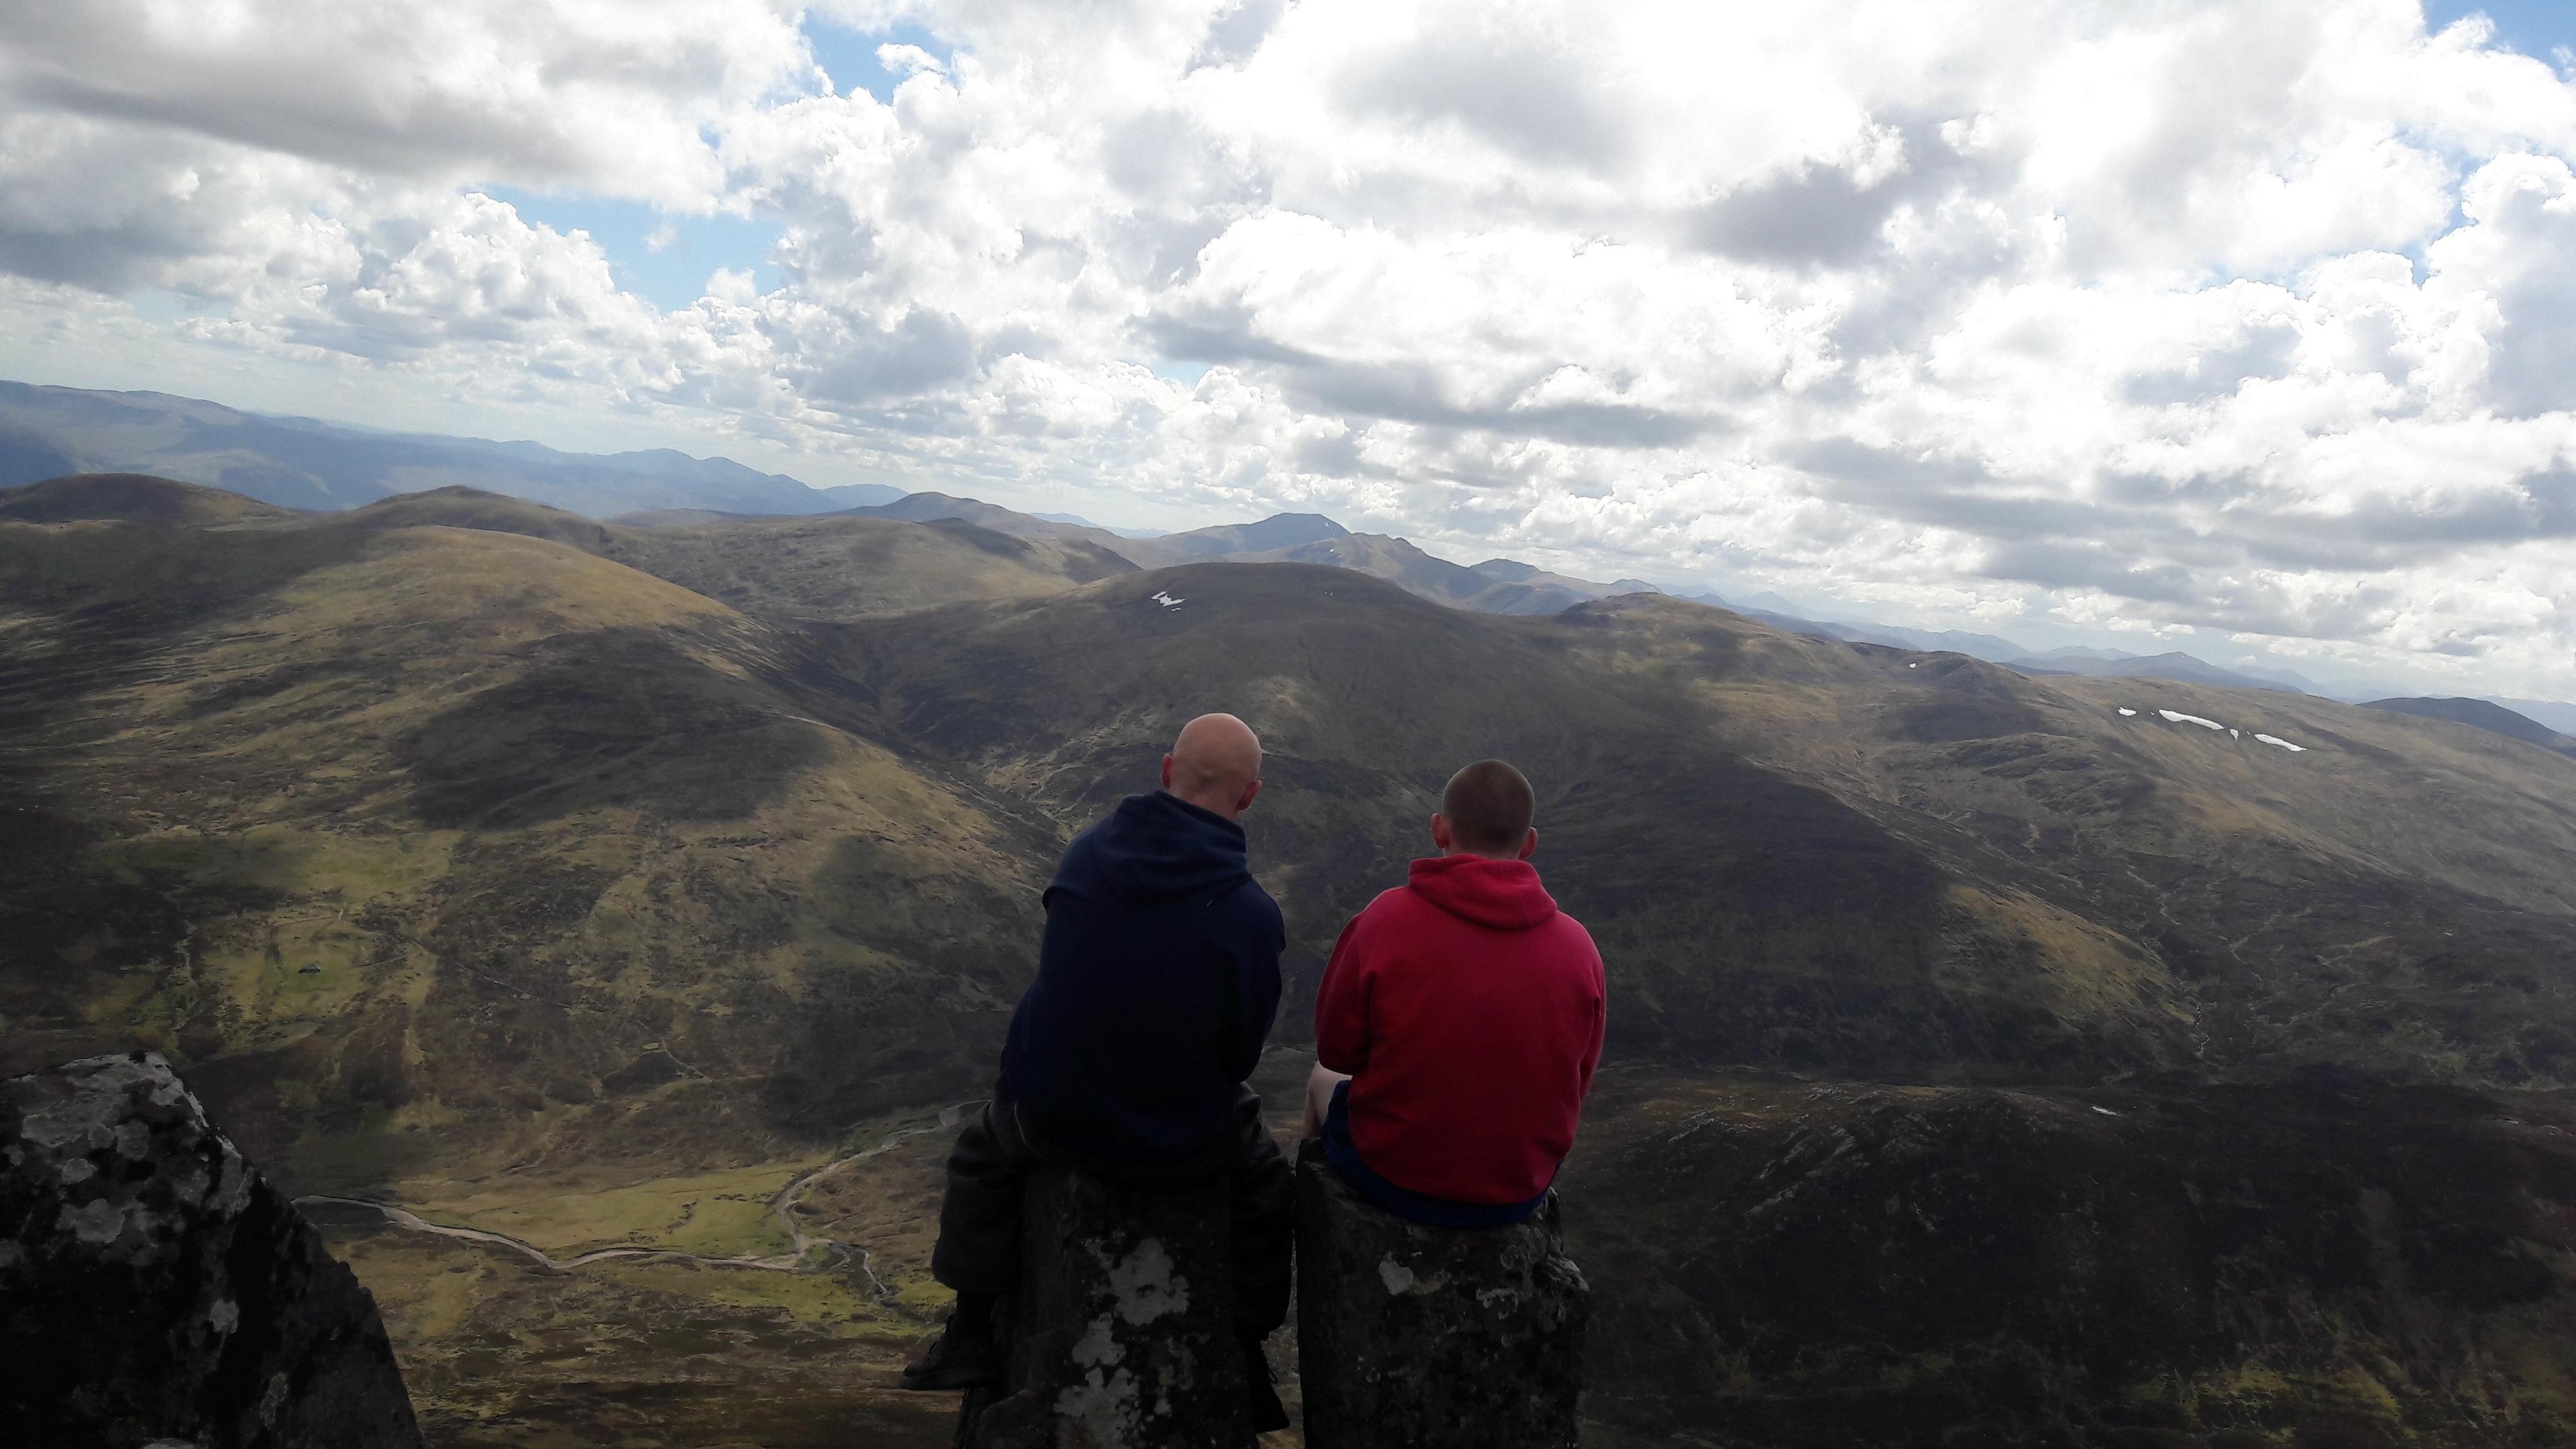 Schiehallion in Scotland My 4th Munro hiking camping outdoors